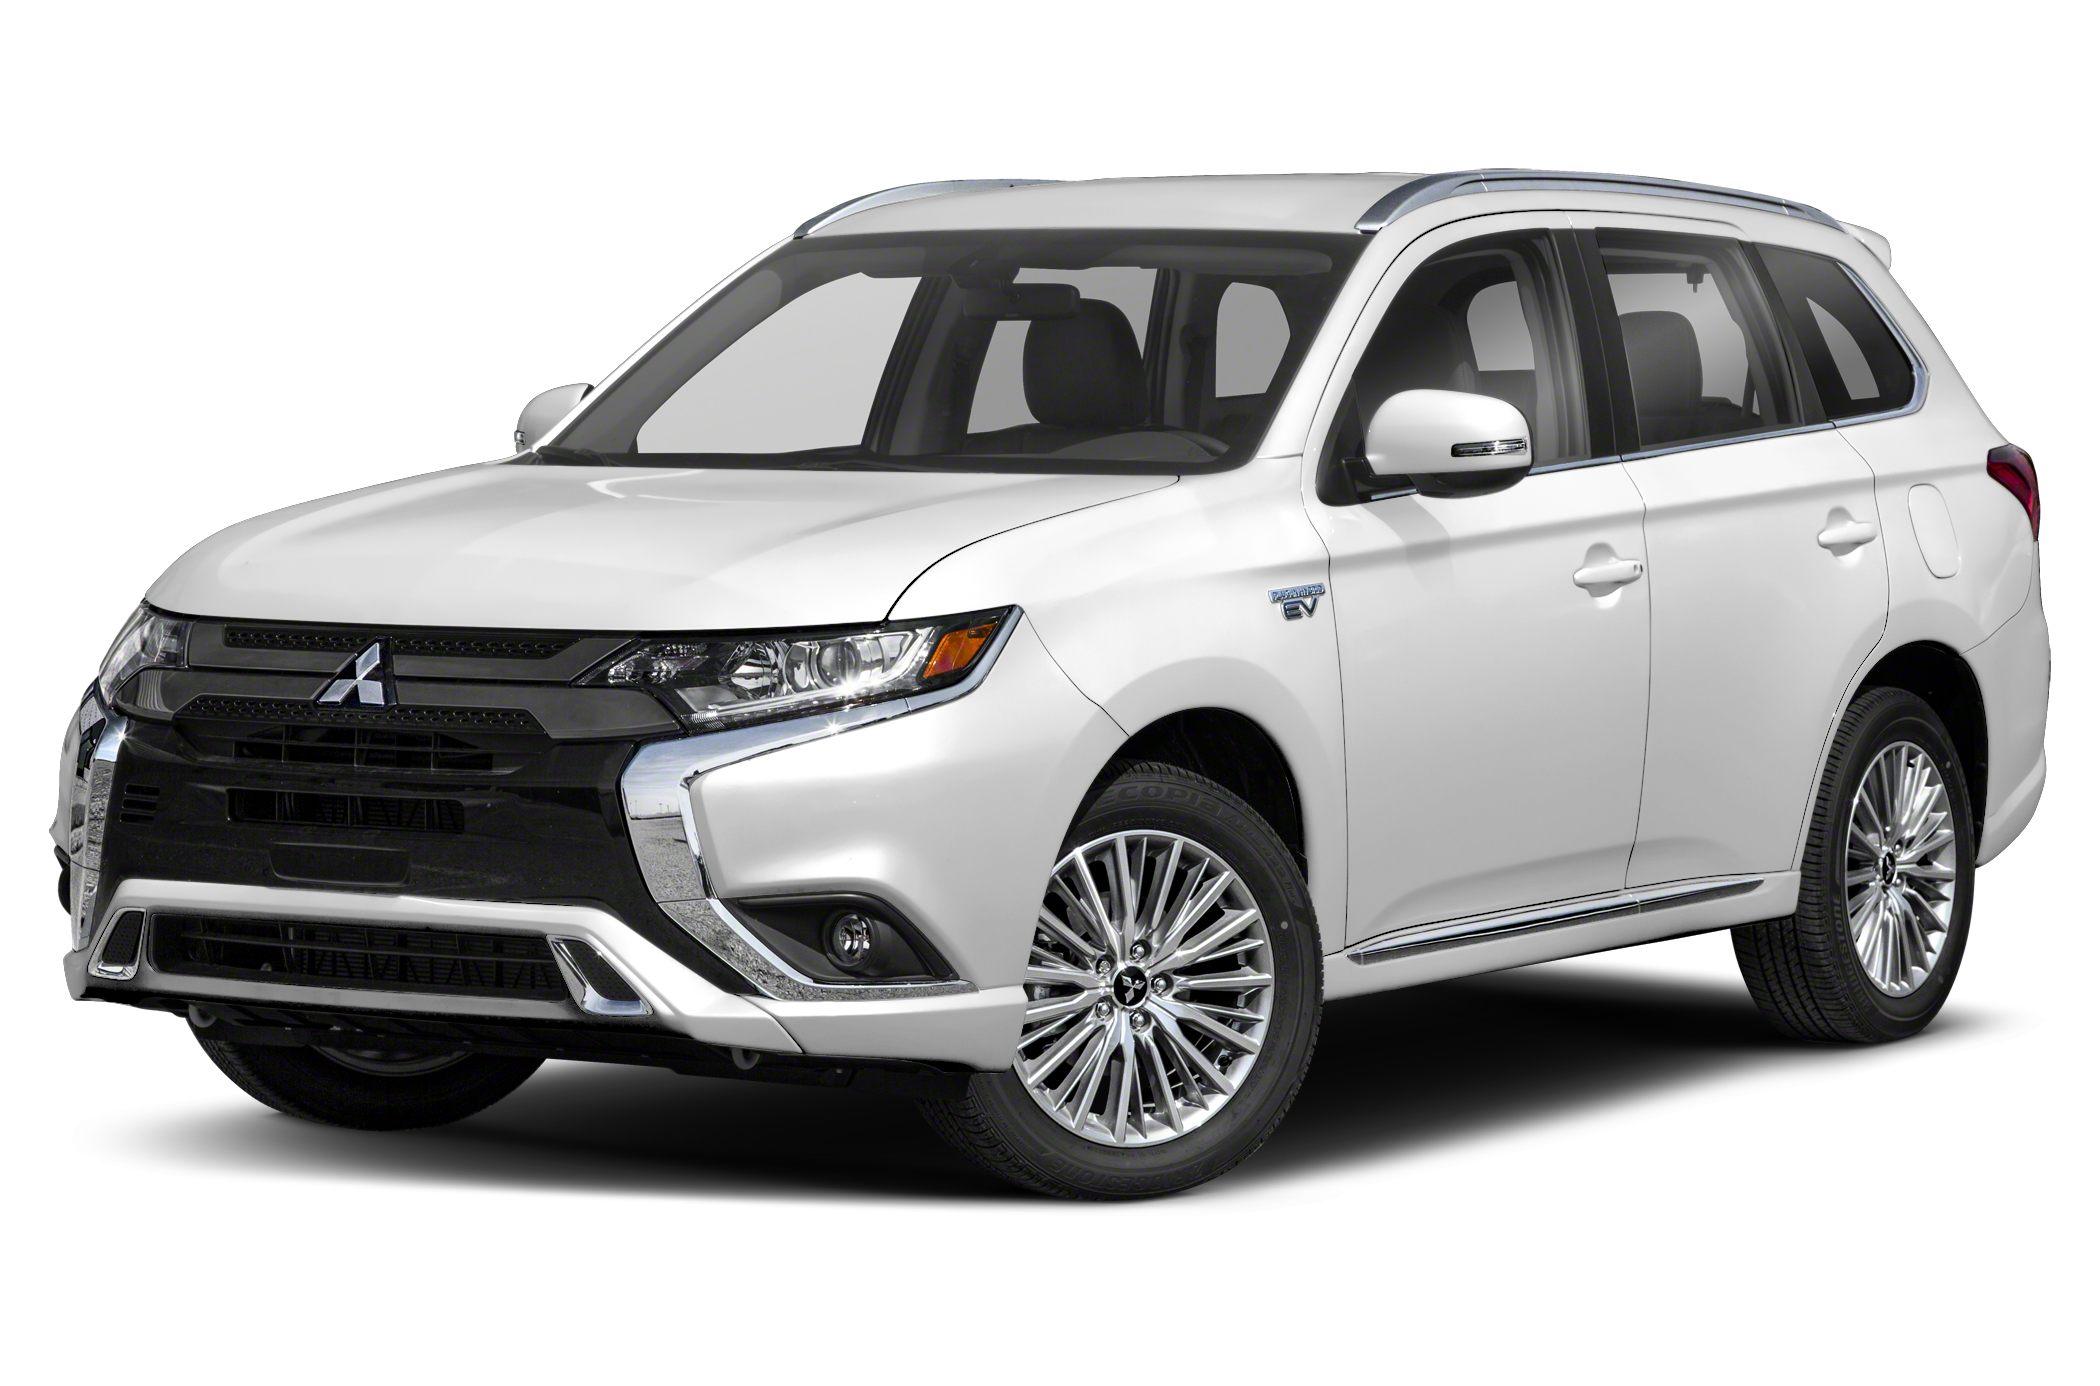 2020 Mitsubishi Outlander Phev Gt